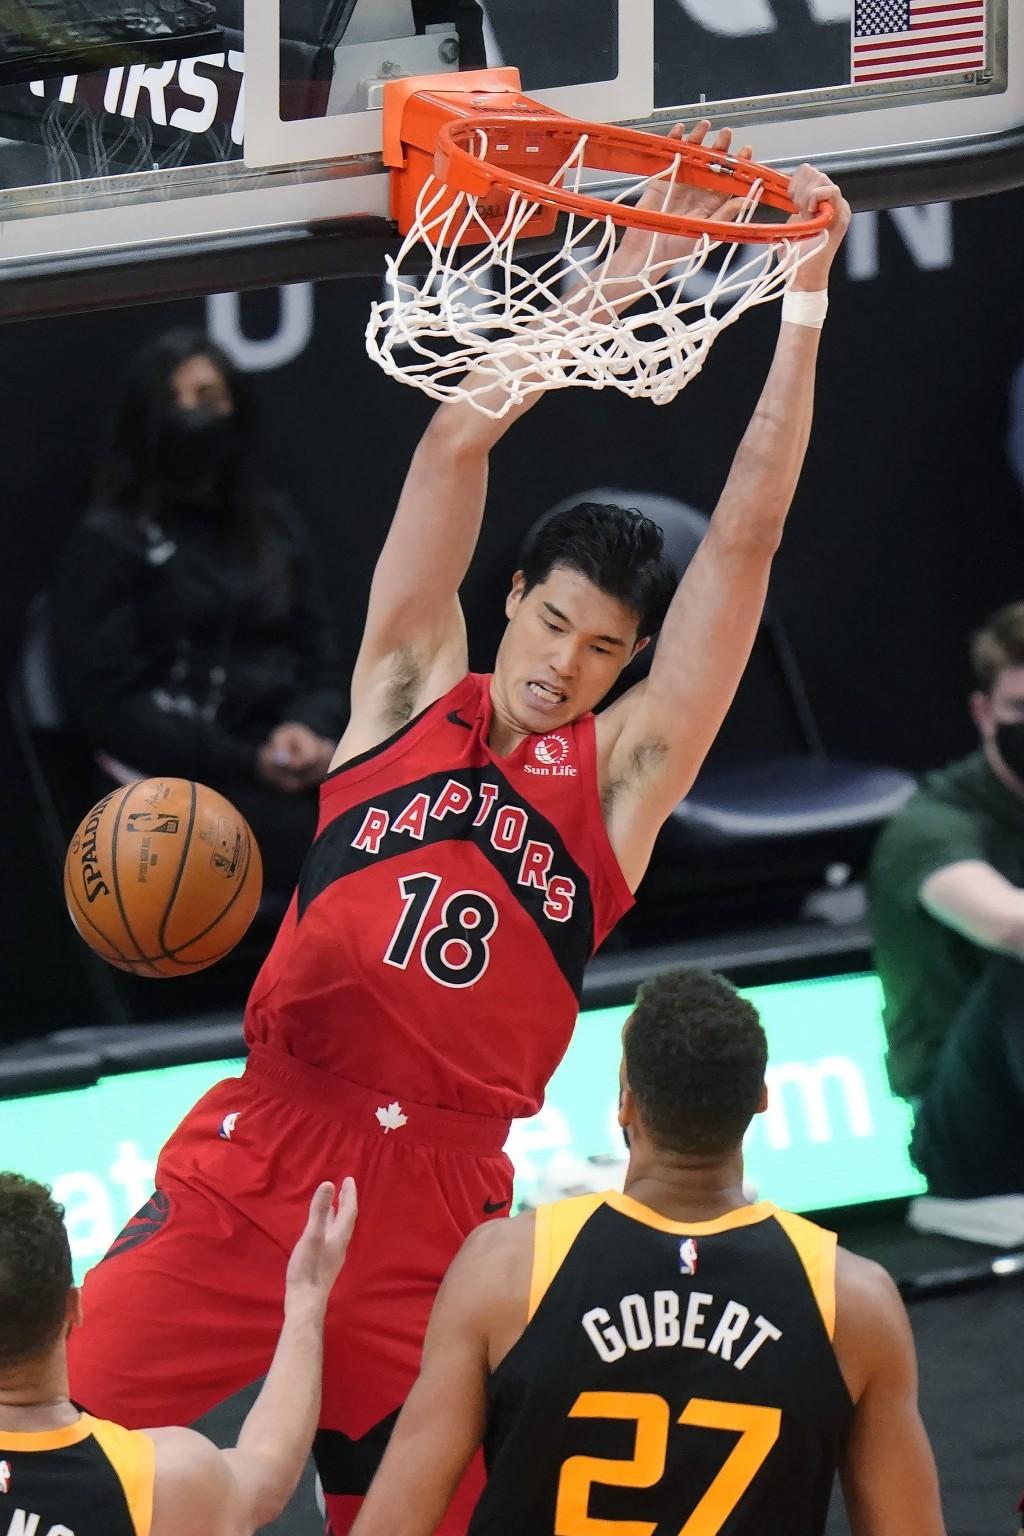 Toronto Raptors forward Yuta Watanabe (18) dunks as Utah Jazz center Rudy Gobert (27) watches during the first half of an NBA basketball game Saturday...